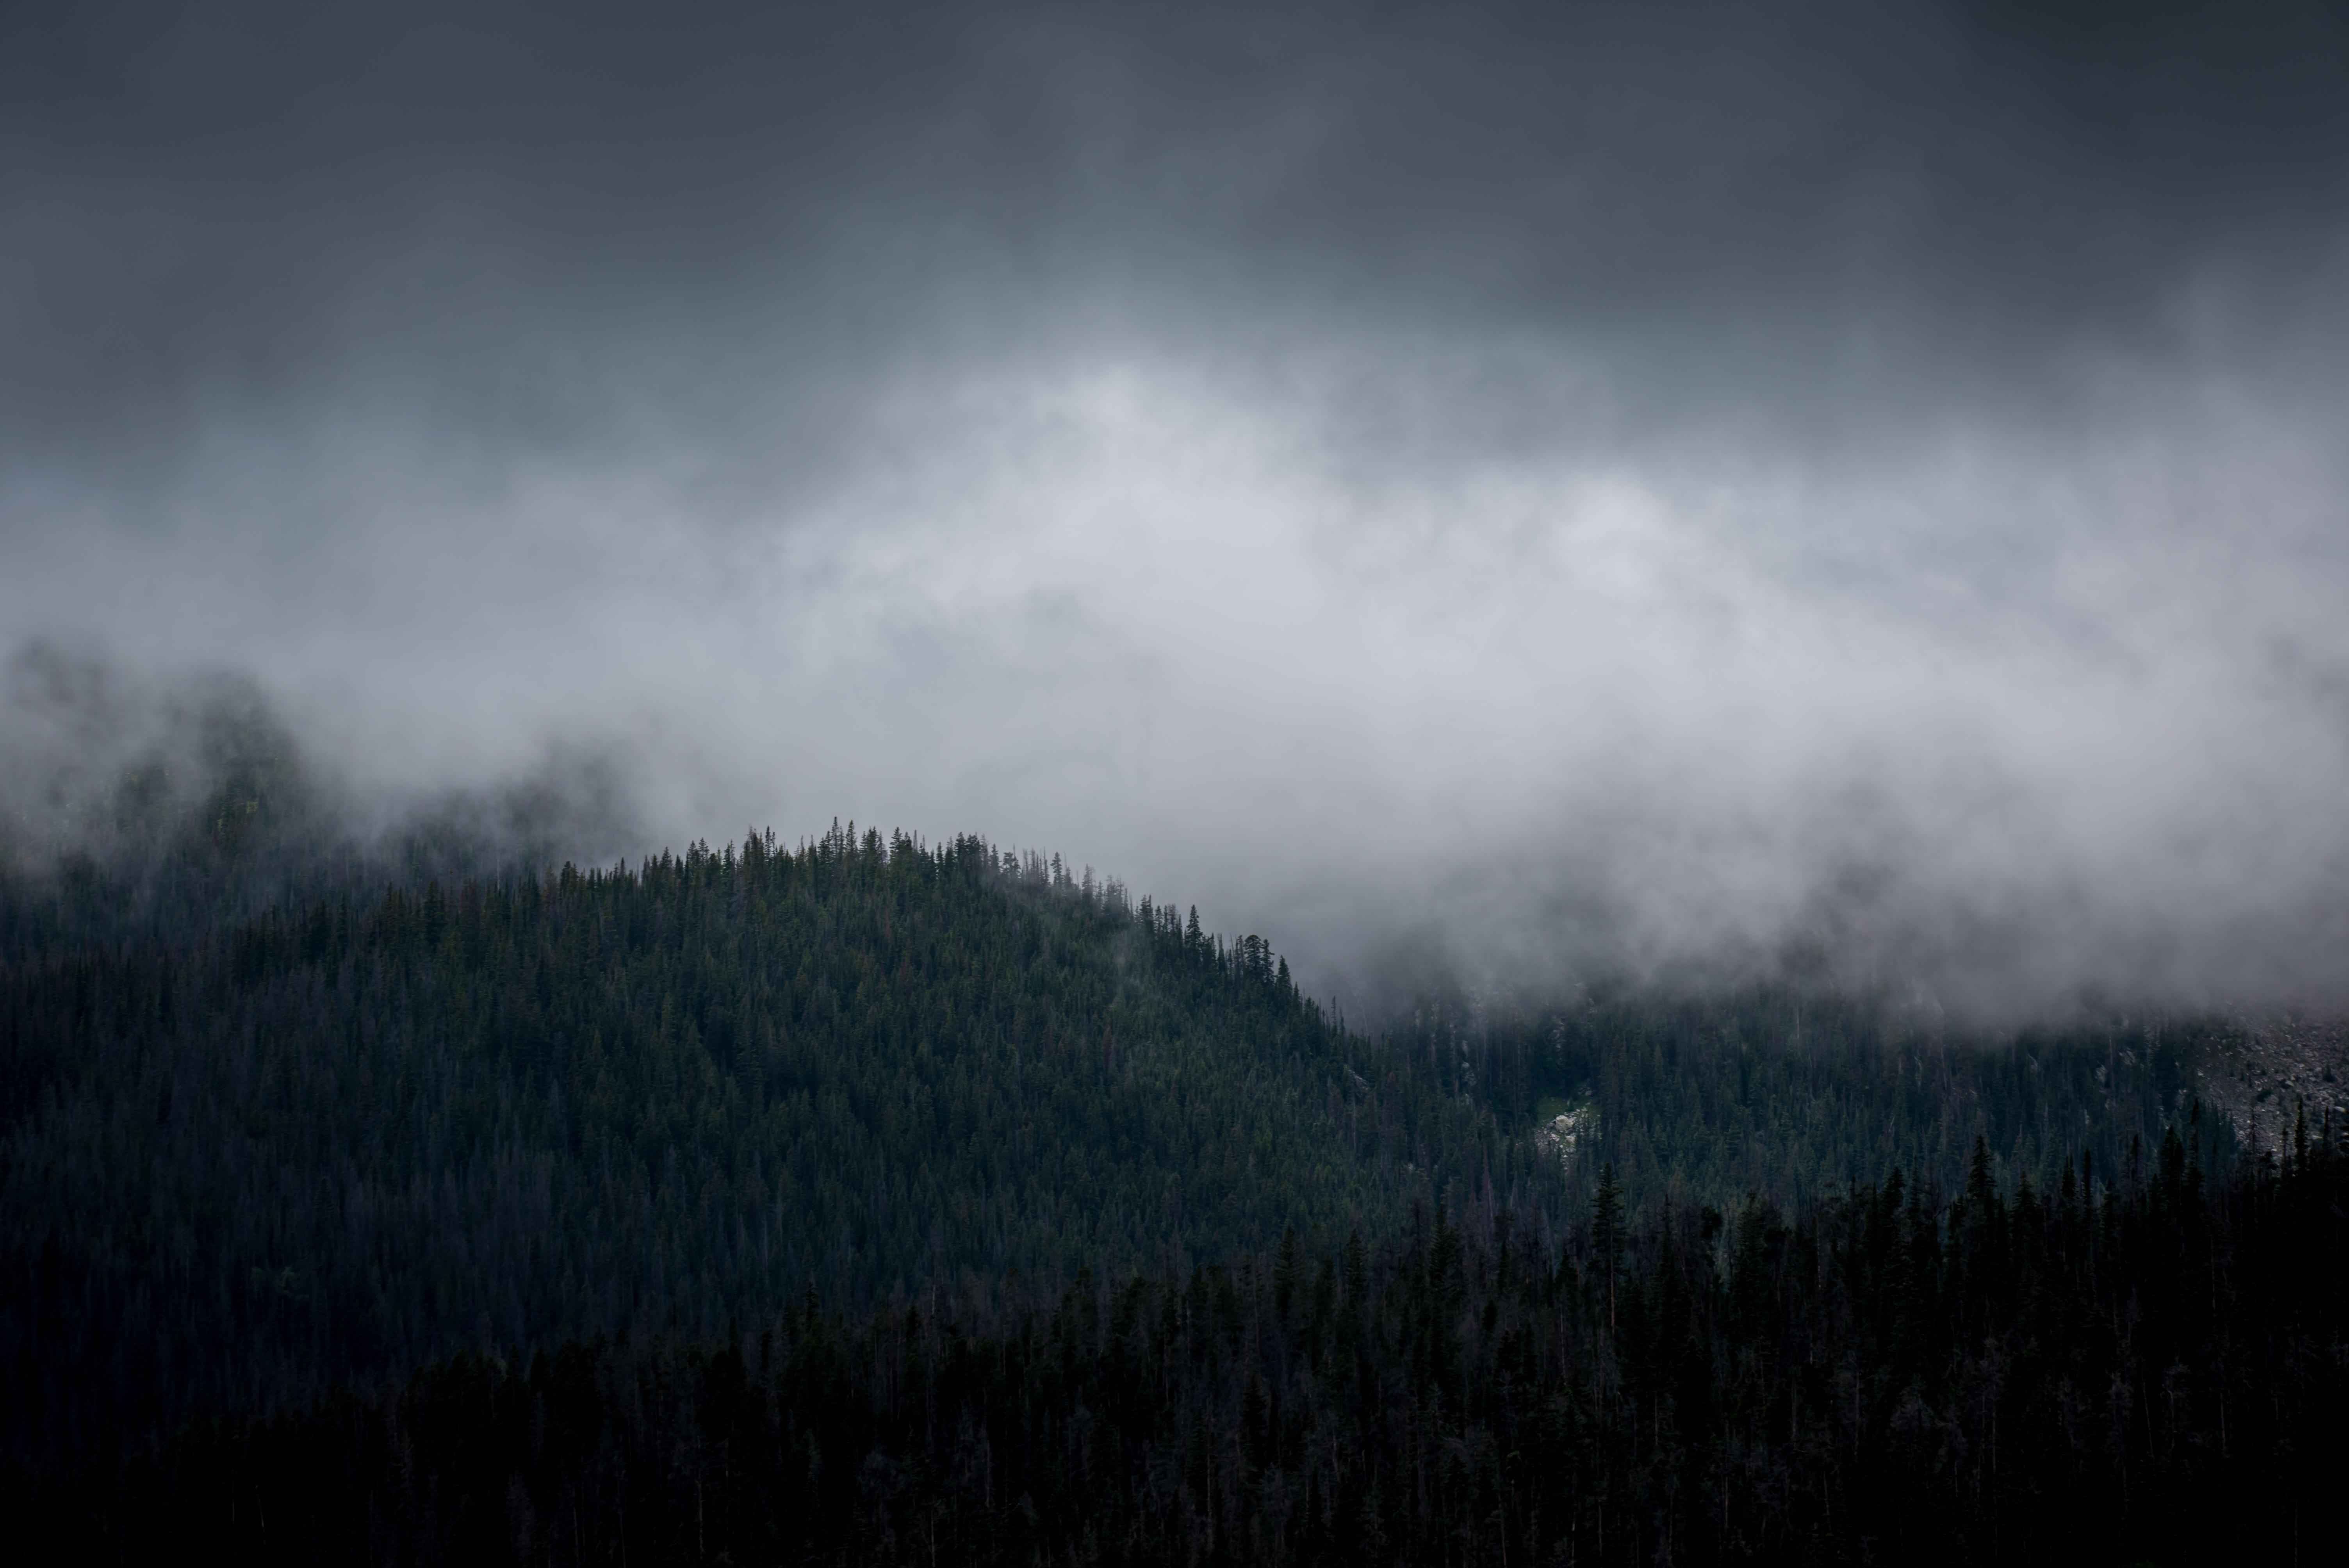 Heavy mist descending on wooded hills